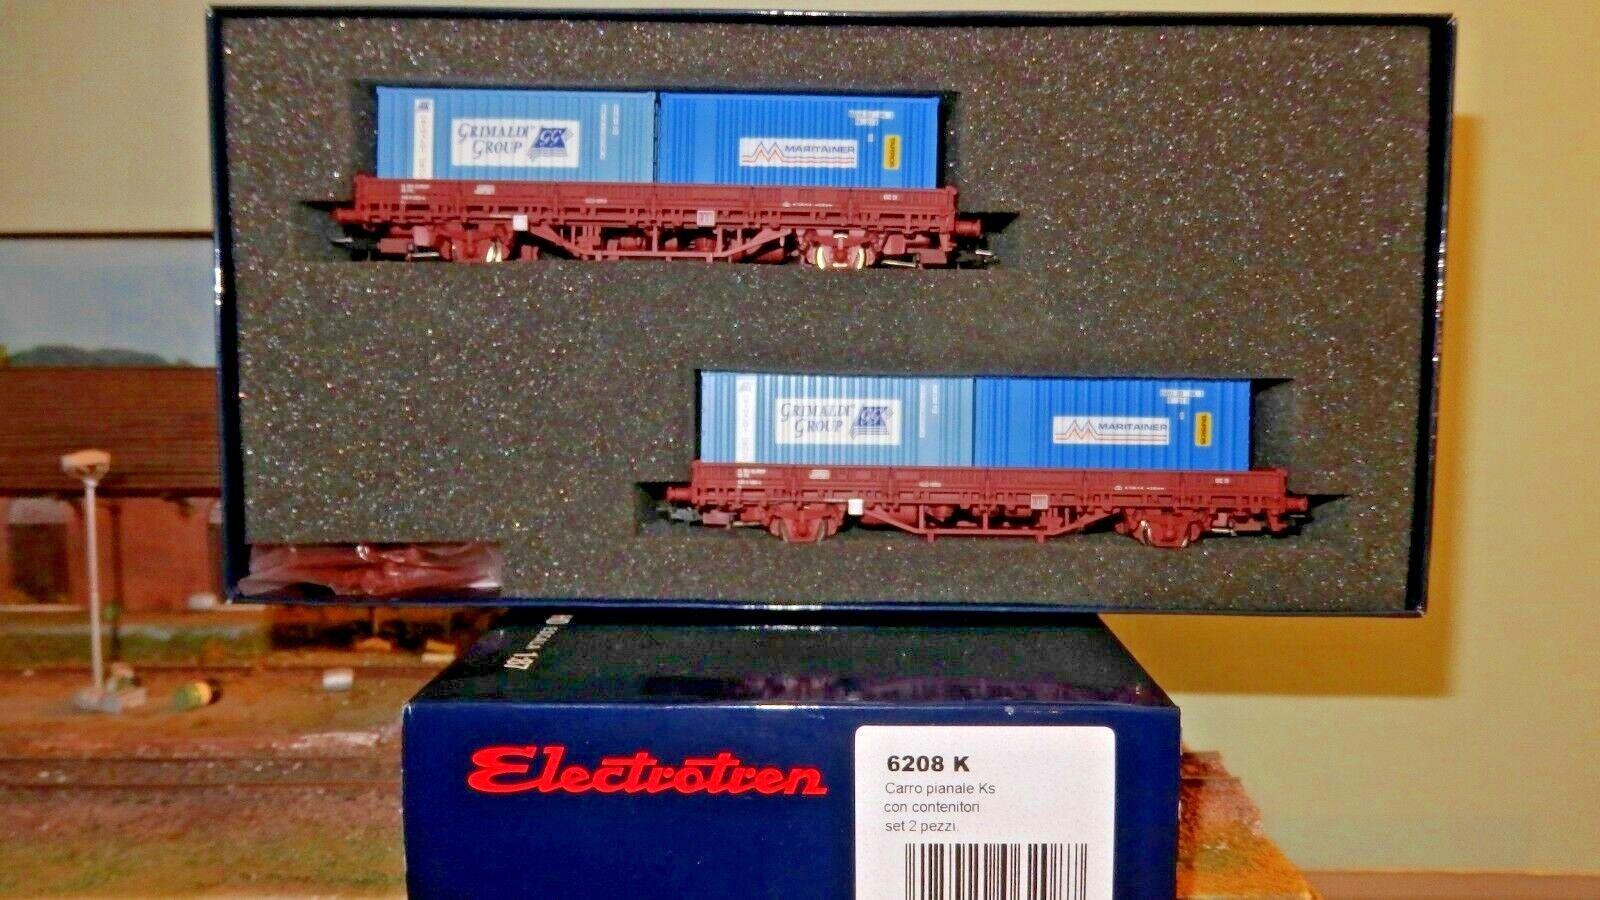 ELECTROTREN 6208 K Set 2 carri Ks 2 assi,container 20  Grimaldi Group + Maritain